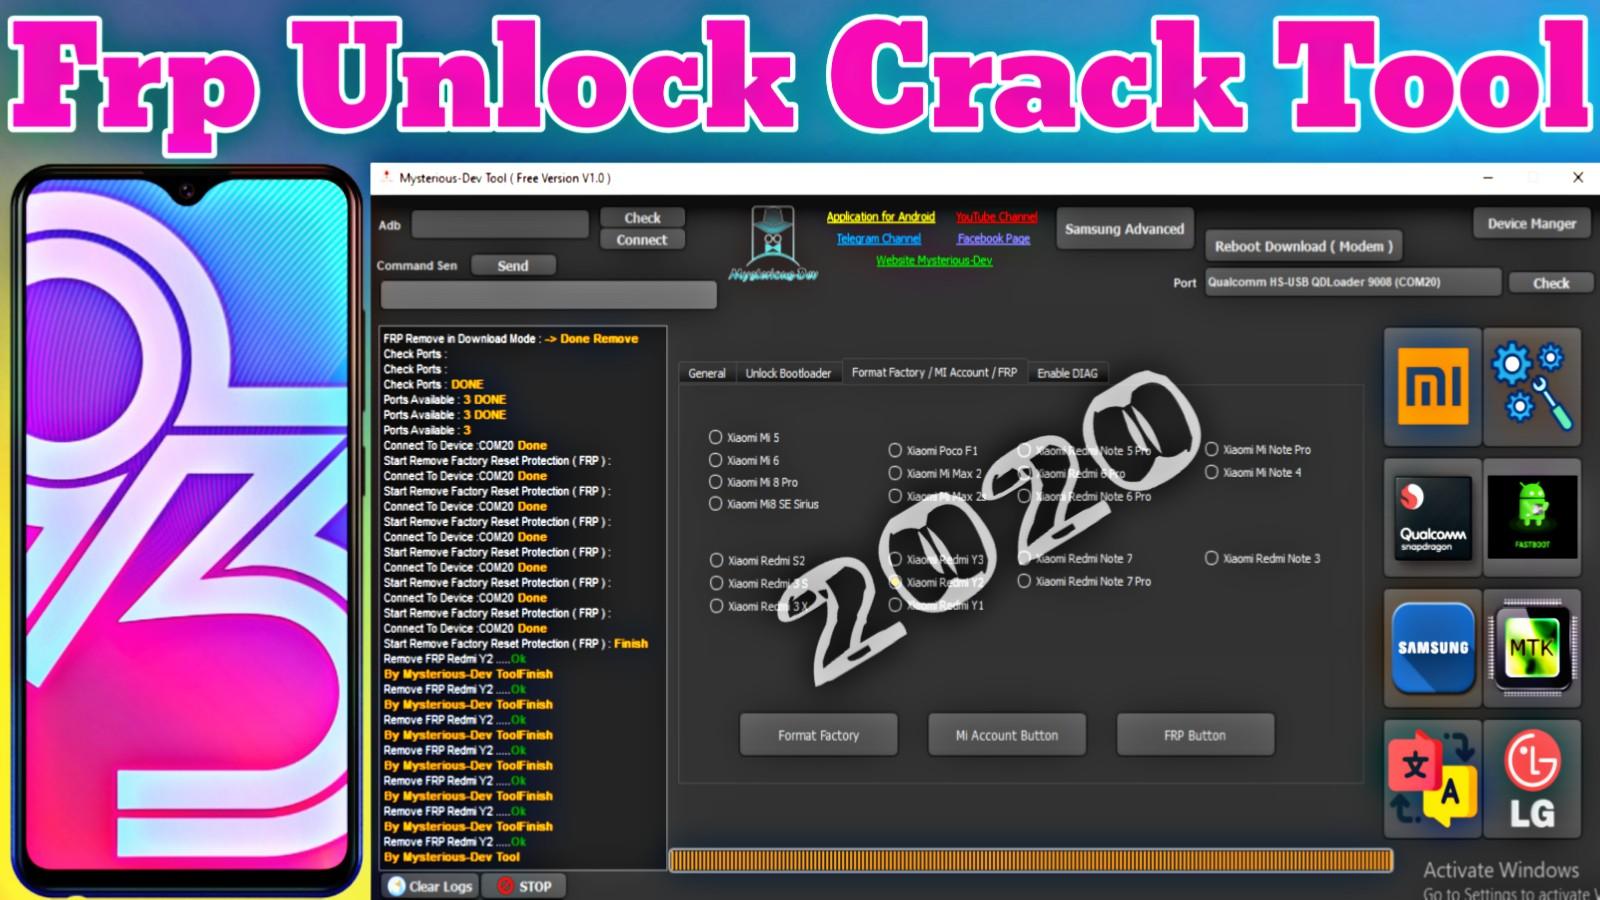 FRP, Mi Account, | Unlock Tool 2020 | Oppo, Vivo, Xiaomi, Qualcomm, | All samsung Frp Bypass Tool